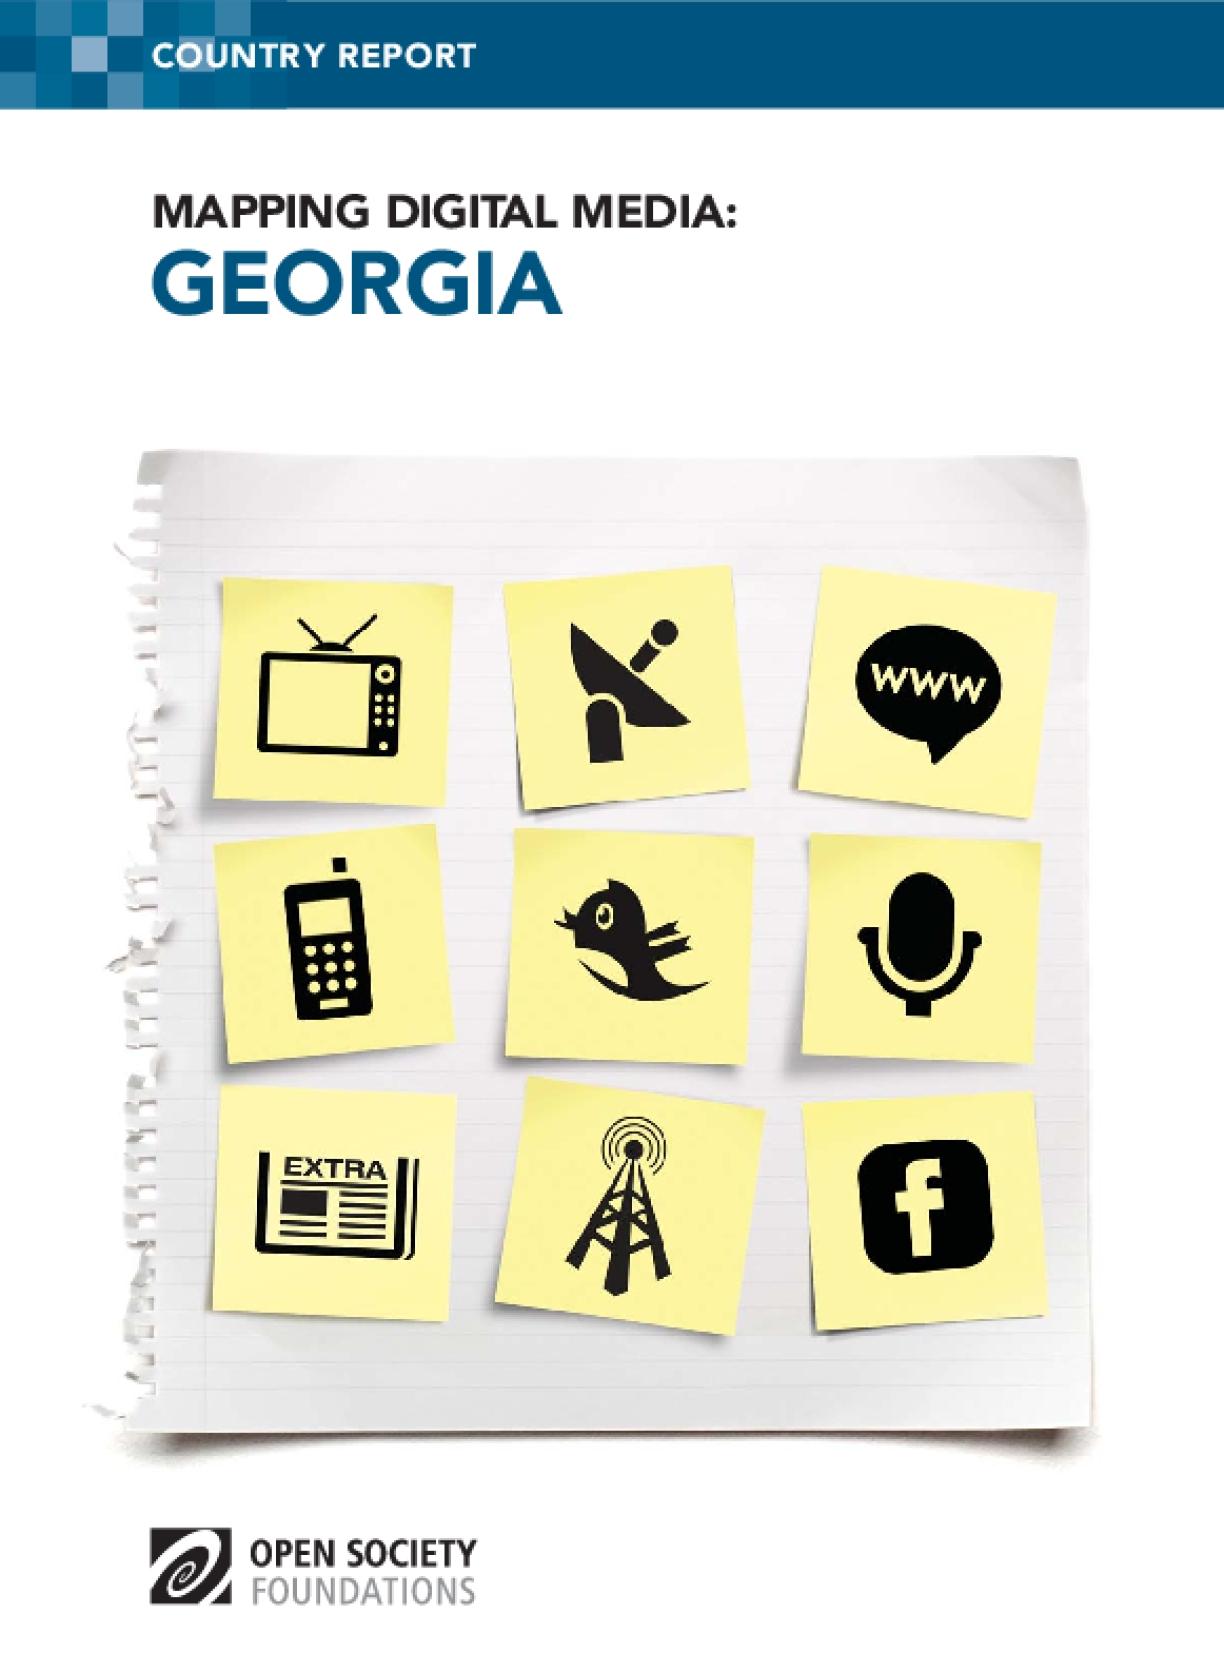 Mapping Digital Media: Georgia